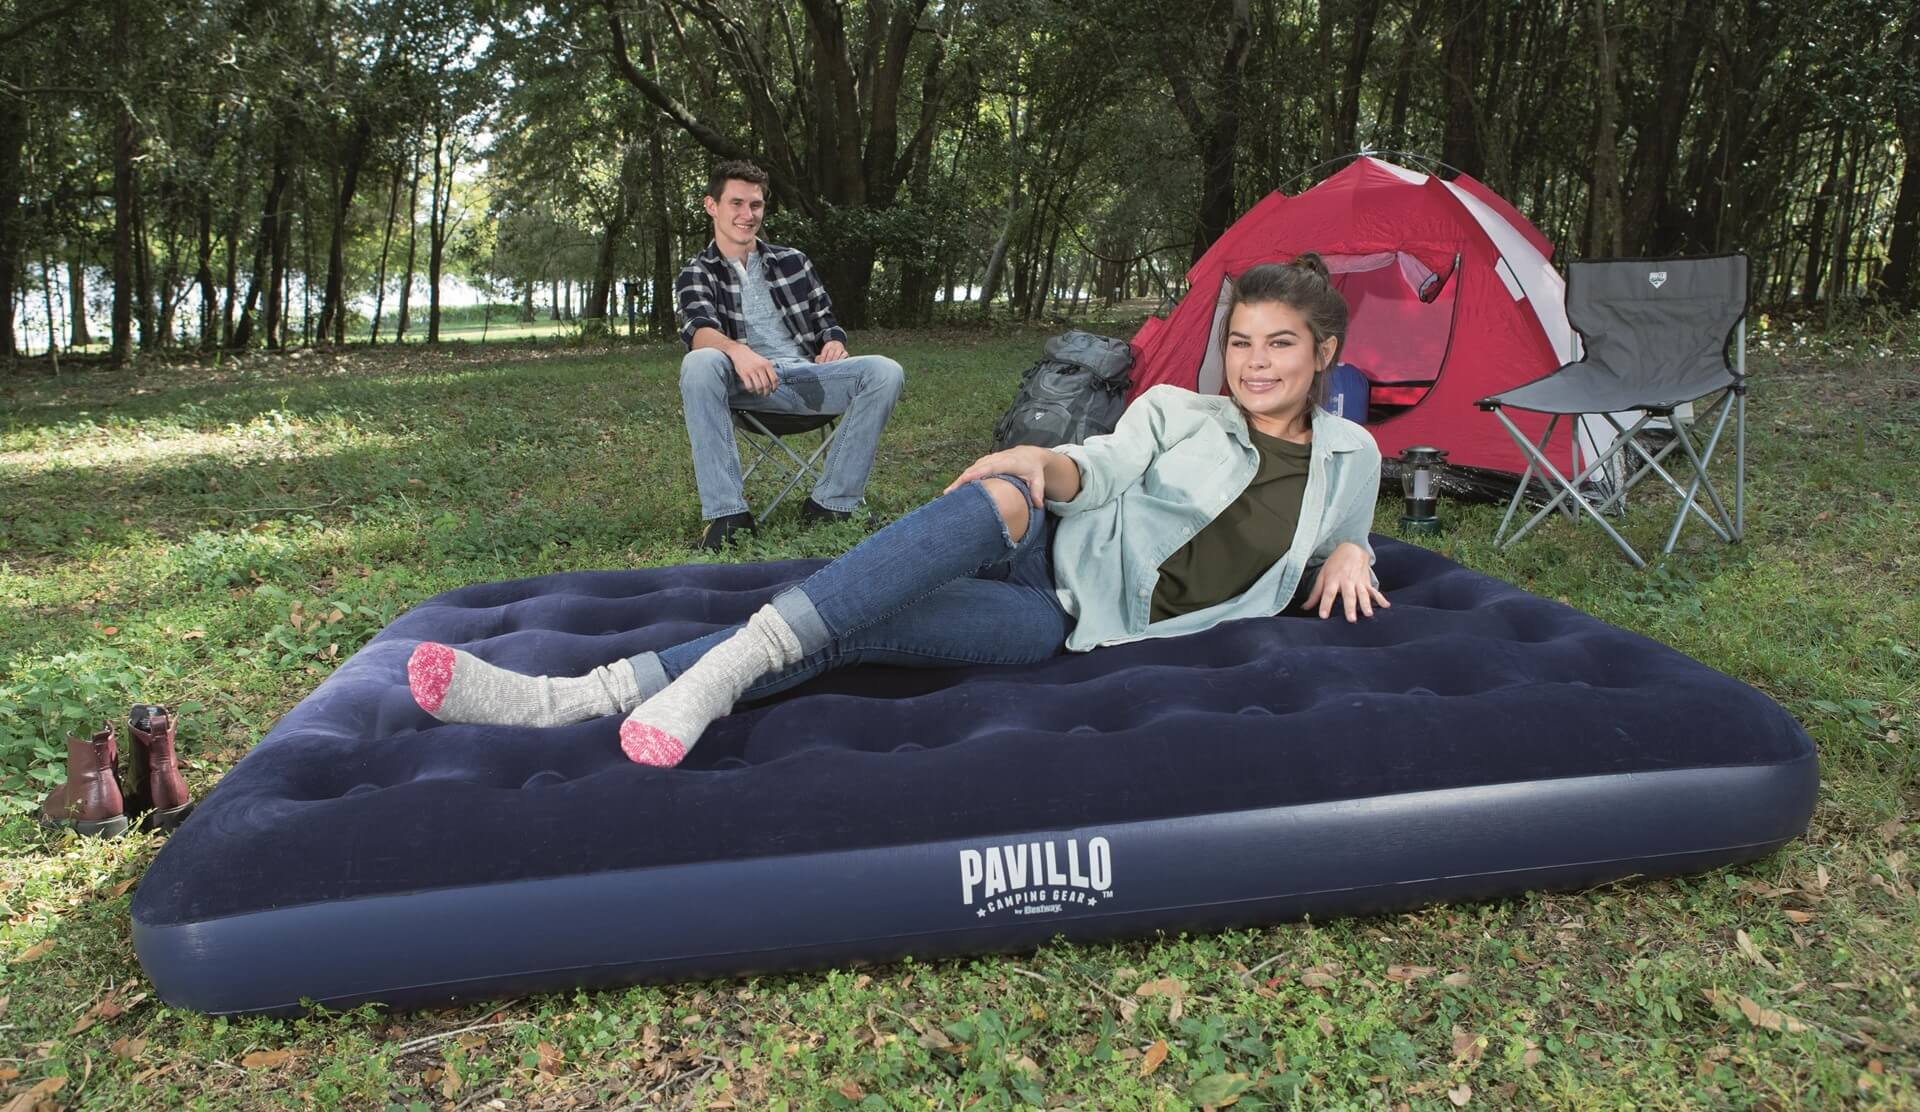 Materac Pavillo firmy Bestway